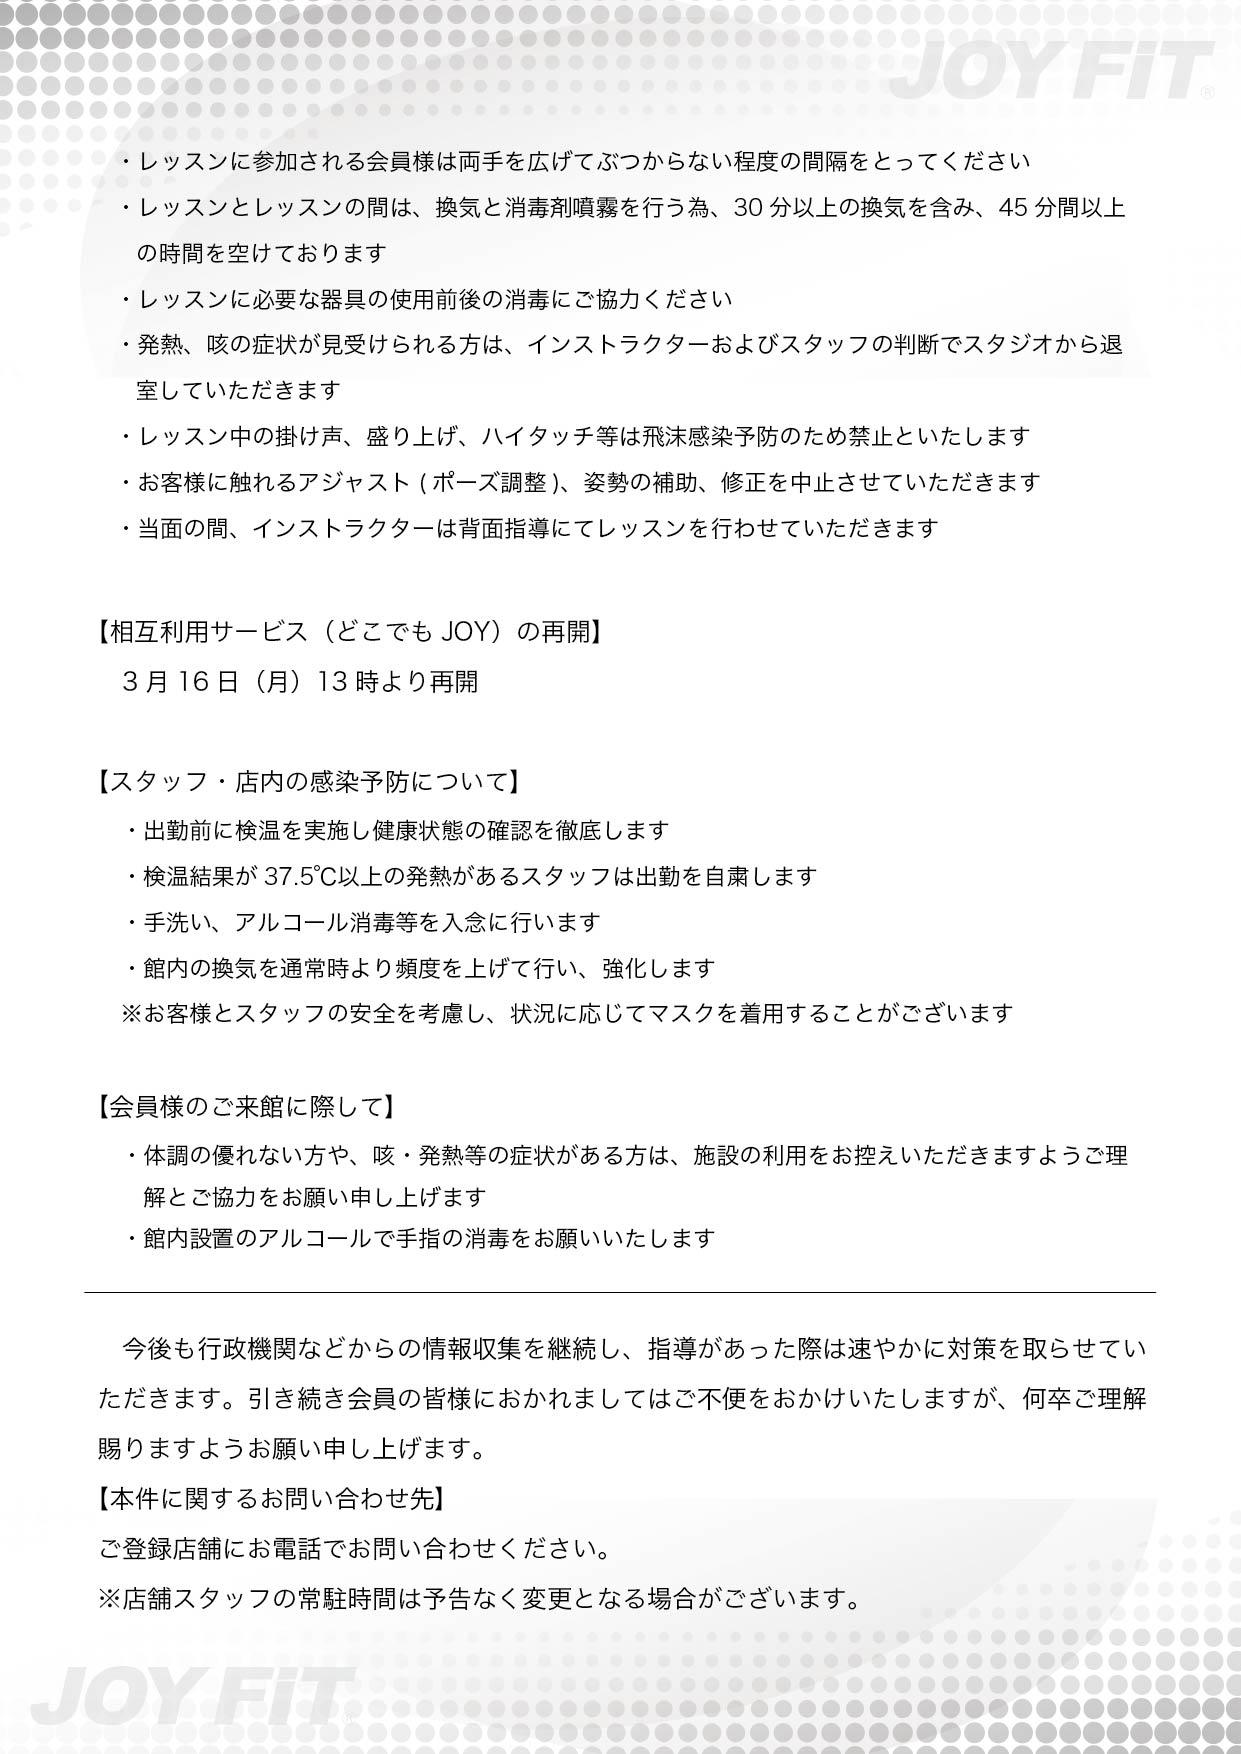 +⑬【JOYFIT】スタジオ・休業店舗・相互利用サービス再開のお知らせ(HP・館内POP・アプリ用)20200313-02